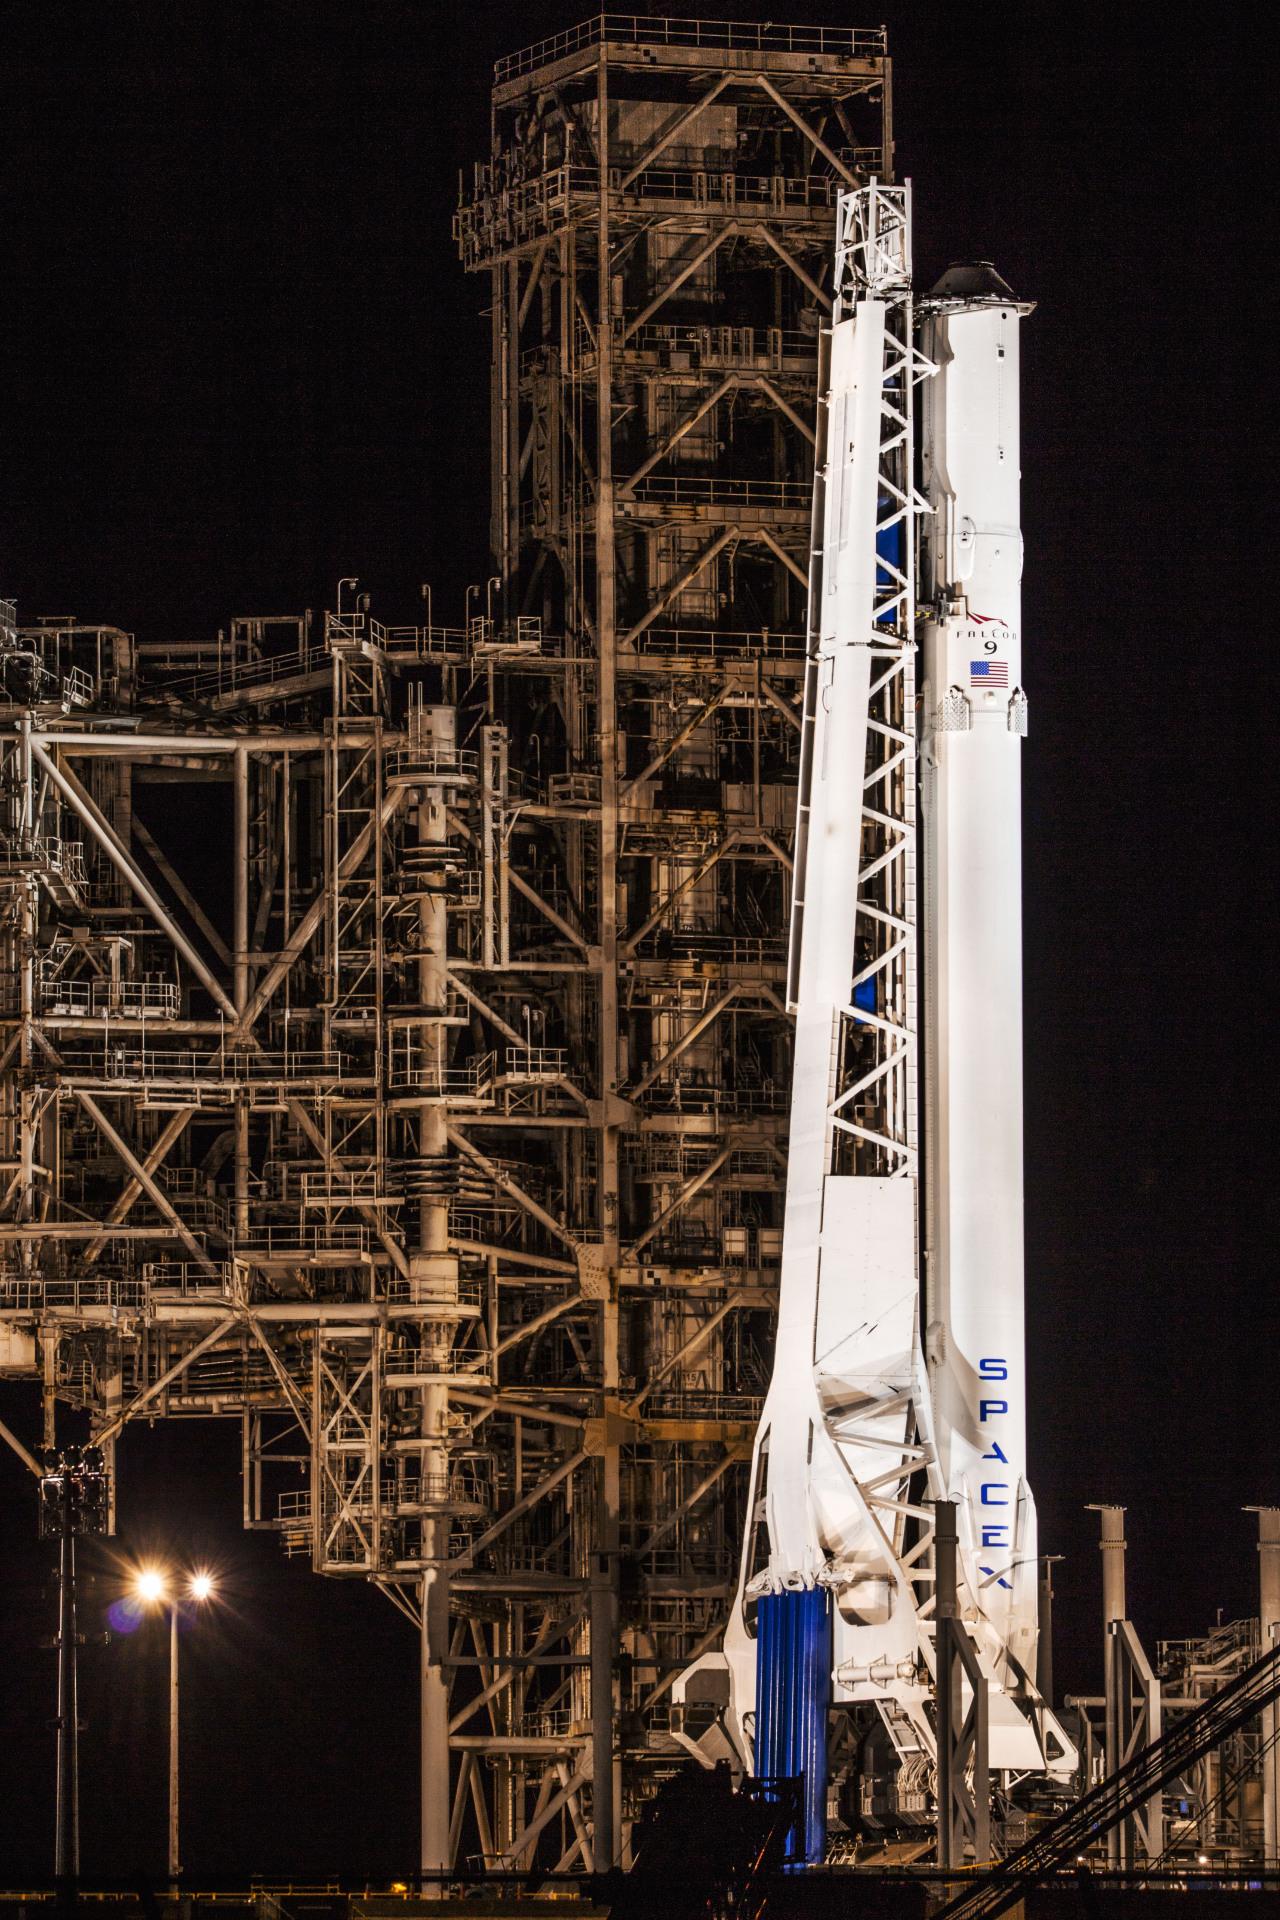 Falcon-9 (CRS-10) - 19.02.17  [Succès] - Page 3 Tumblr_ol6ztq3RMq1ttka3go10_1280